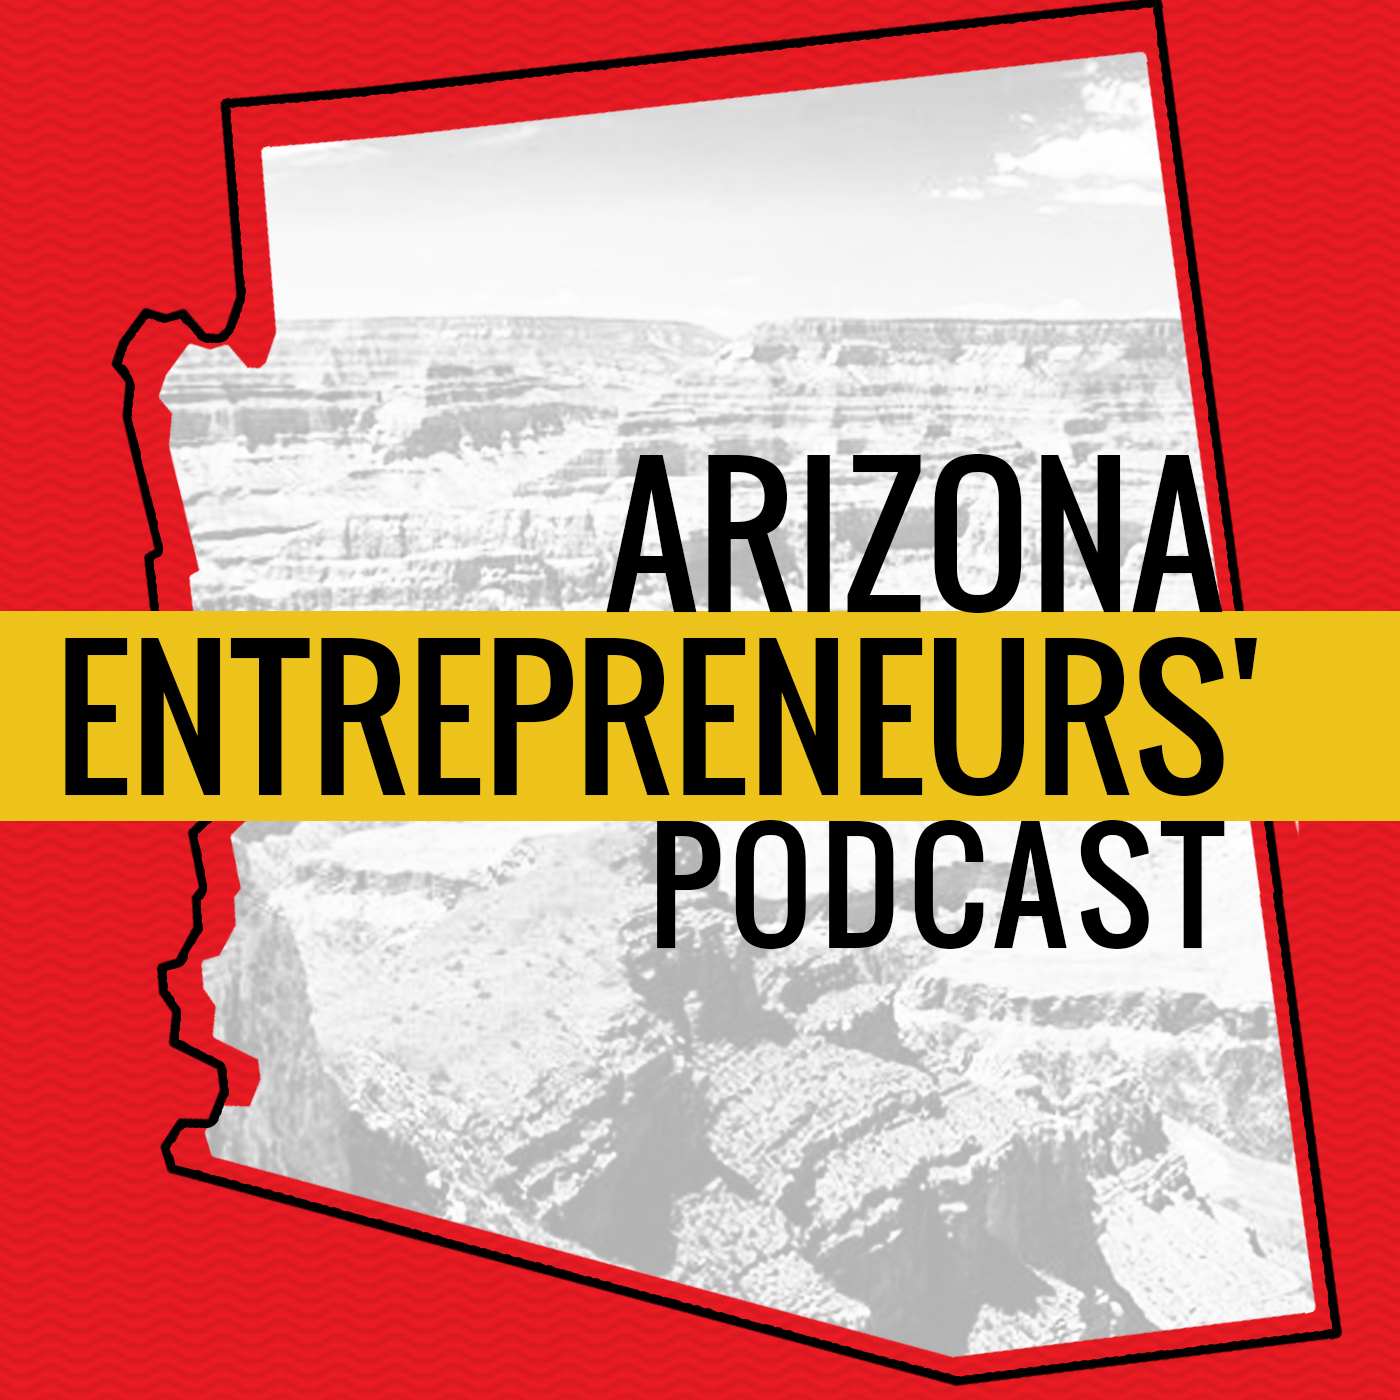 ArizonaEntrepreneurscoverartFINAL.jpg